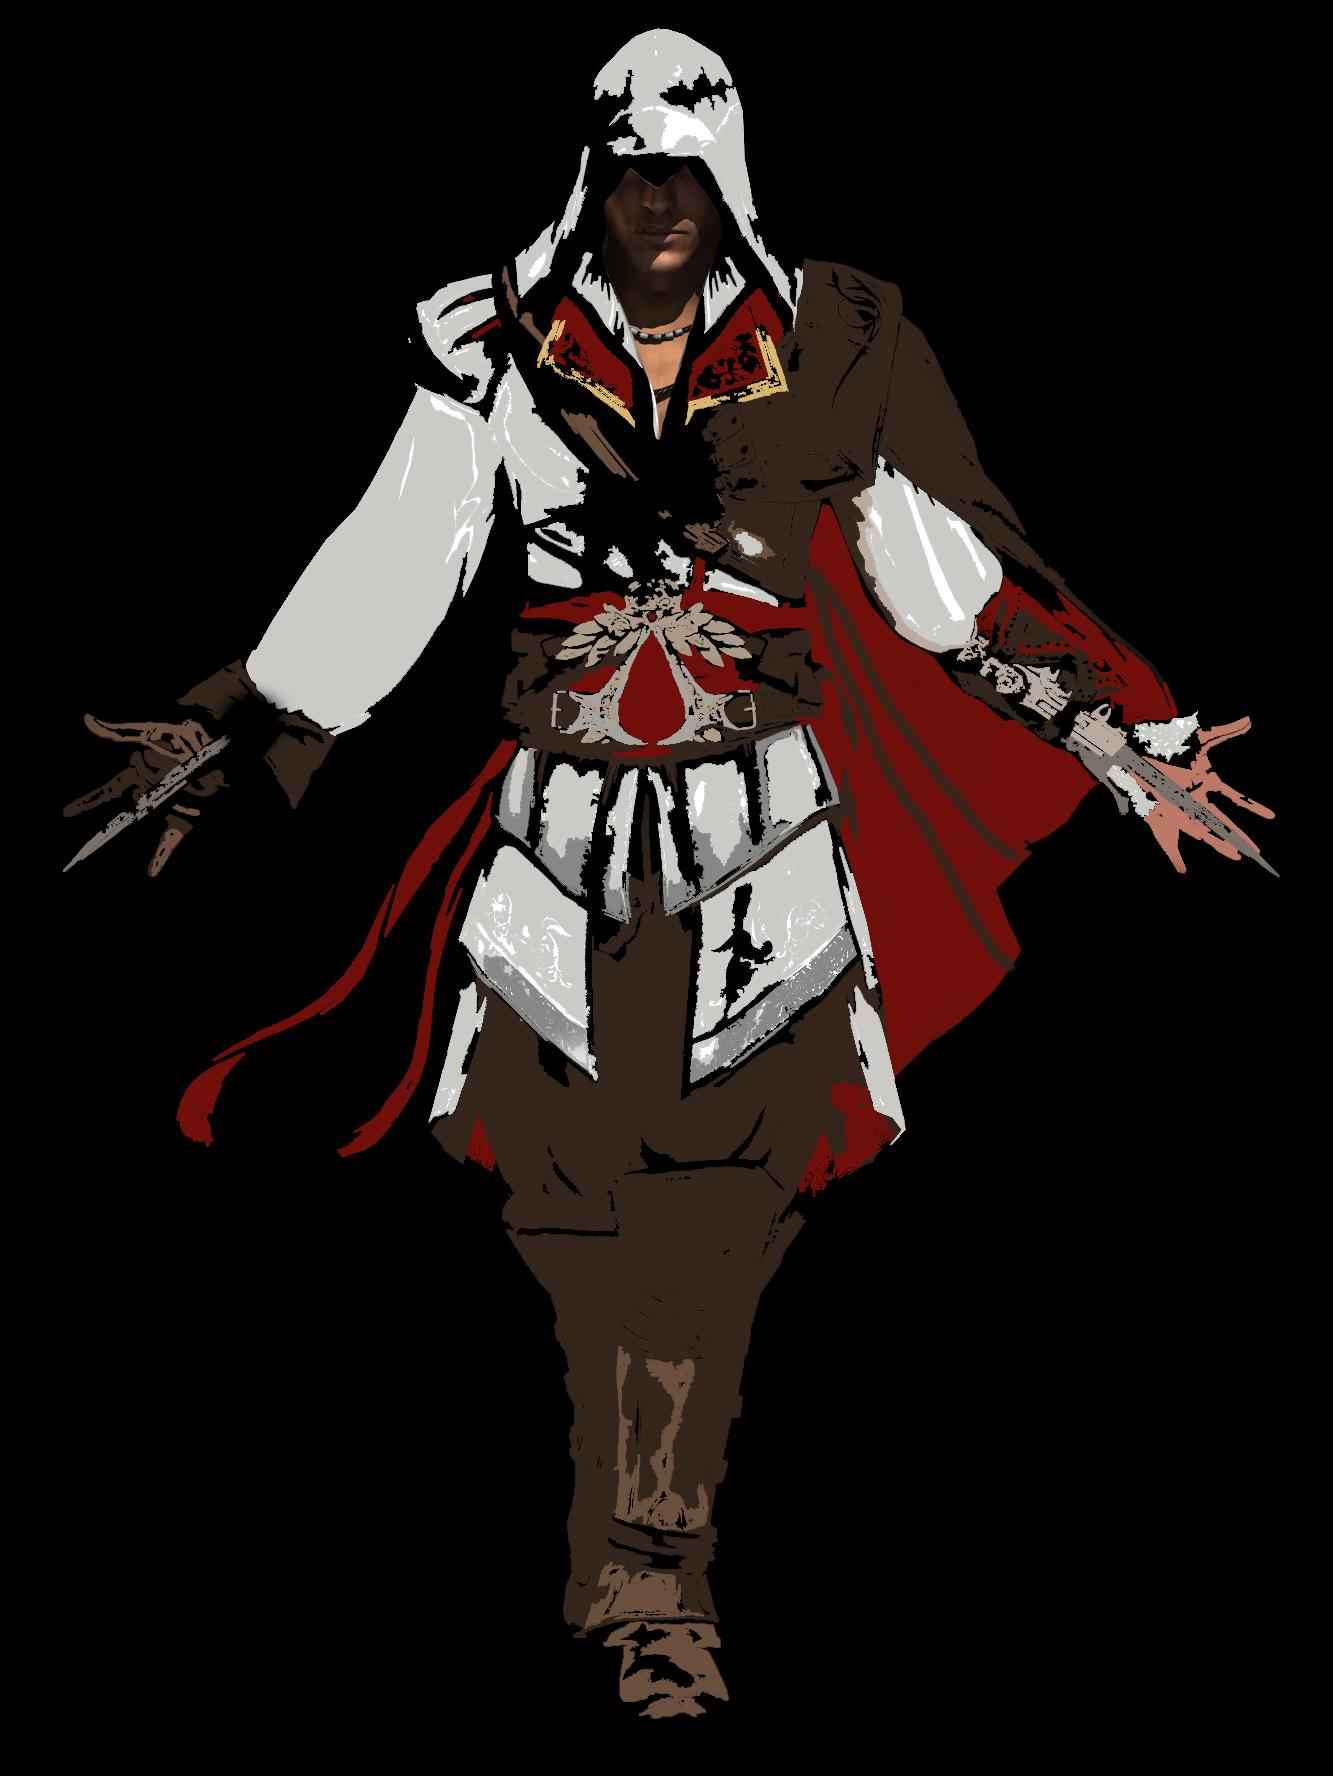 Ezio Auditore Da Firenze Fanart By Phycophoenix On Deviantart